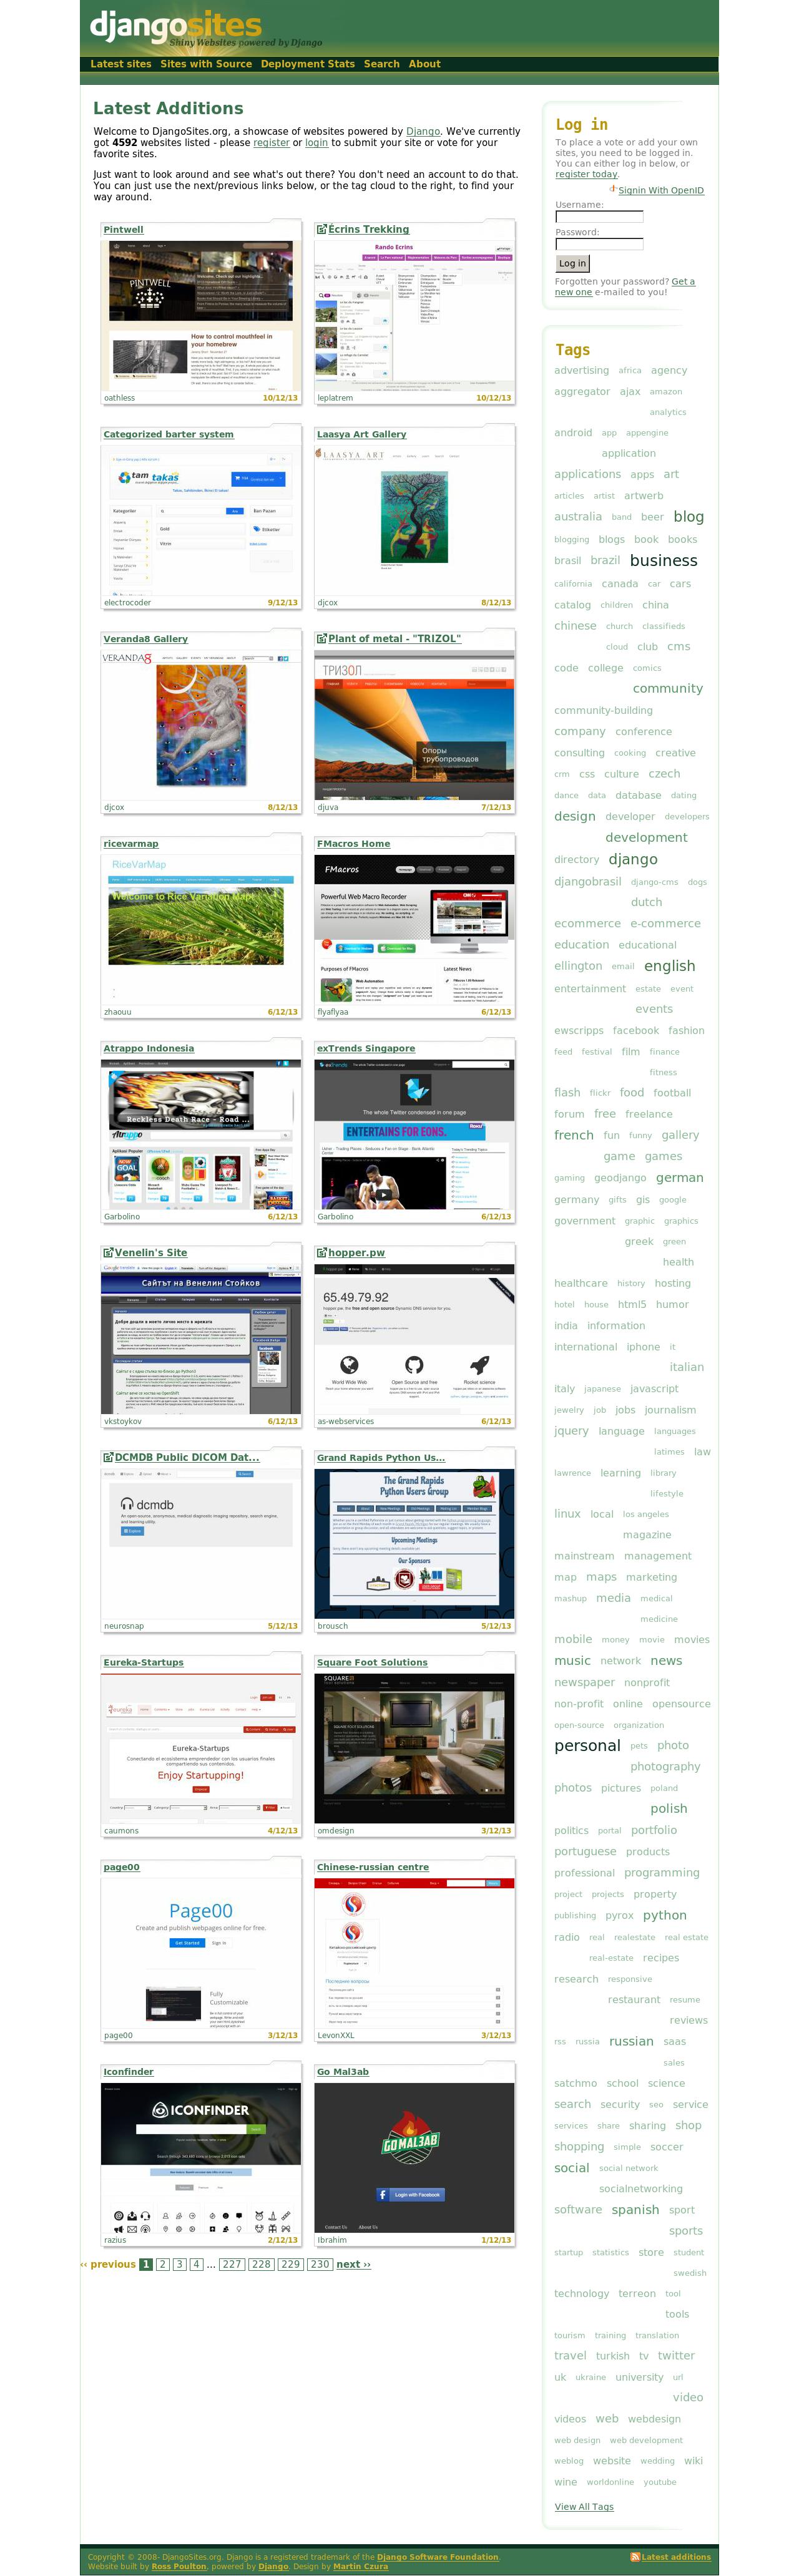 DjangoSites Homepage